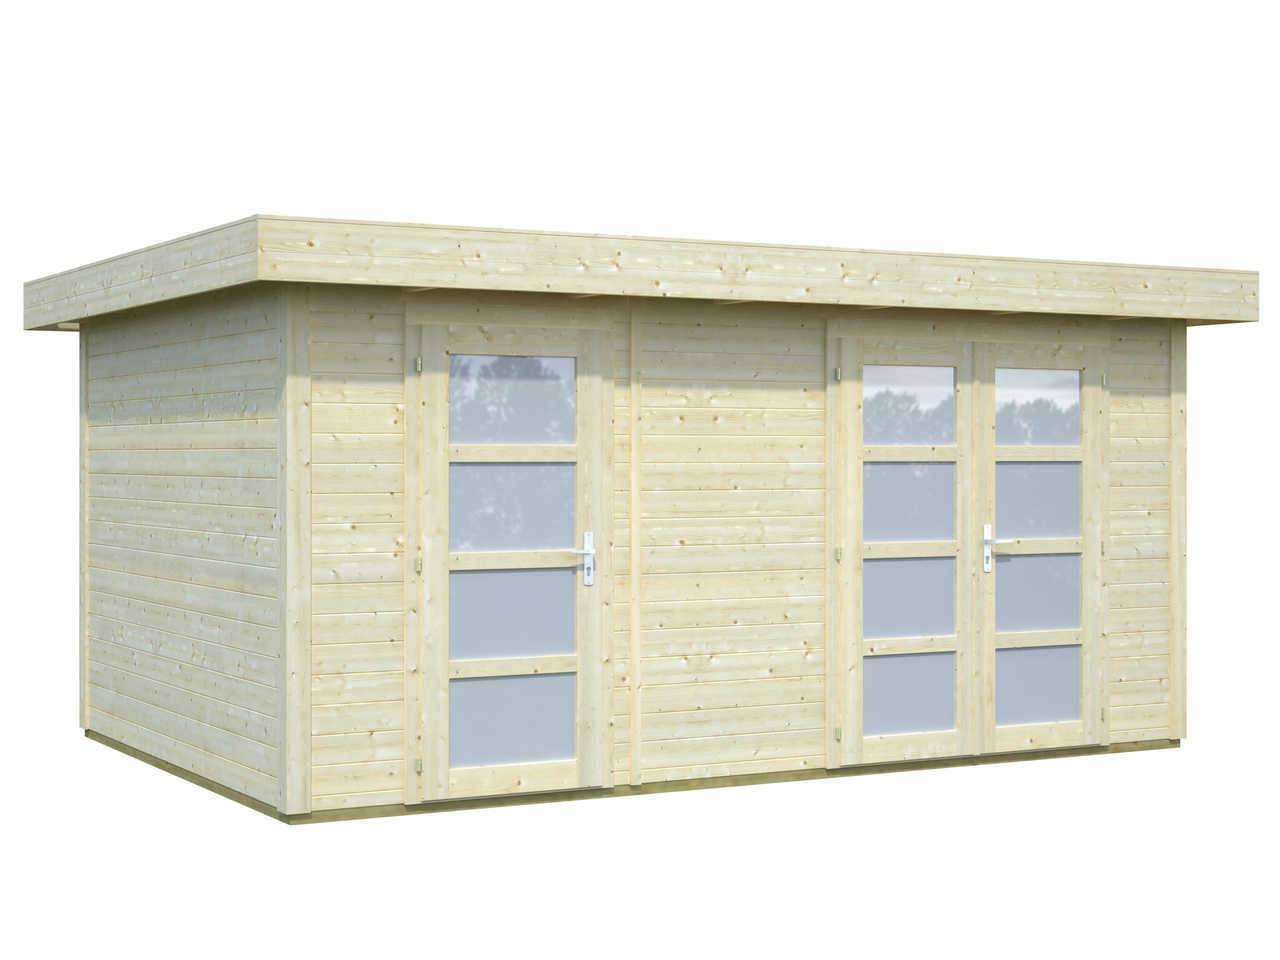 28 mm gartenhaus lara 12 7 m 445 x 295 palmako ger tehaus. Black Bedroom Furniture Sets. Home Design Ideas